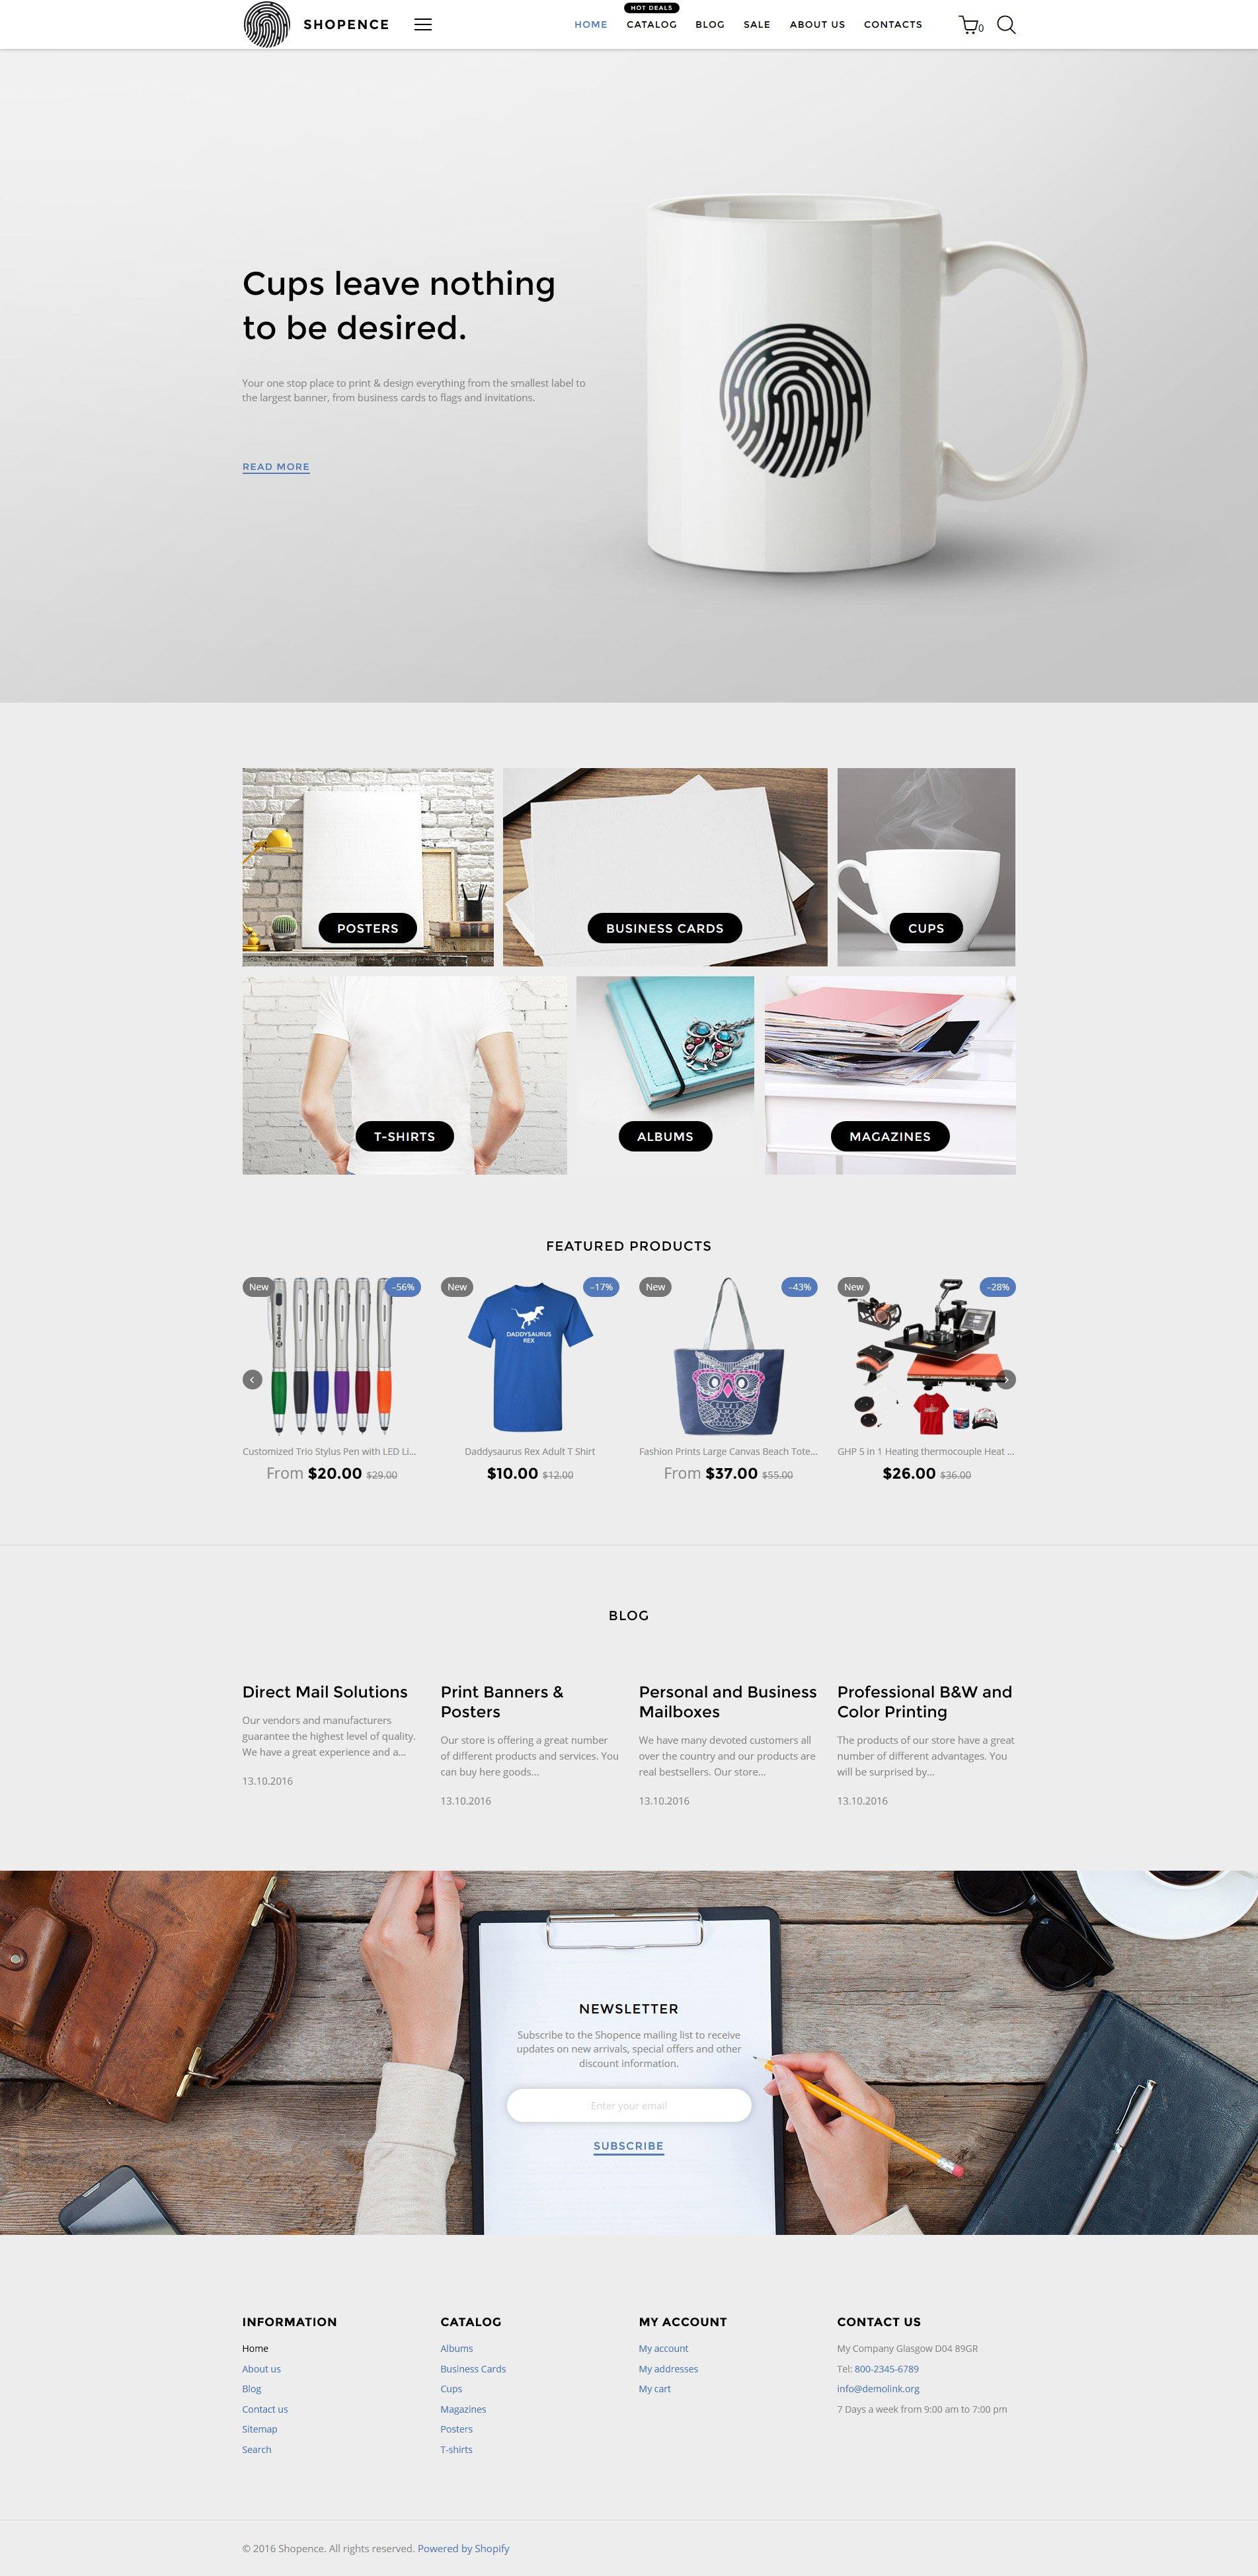 Shopence - Printing Shop & Printing Company Shopify Theme